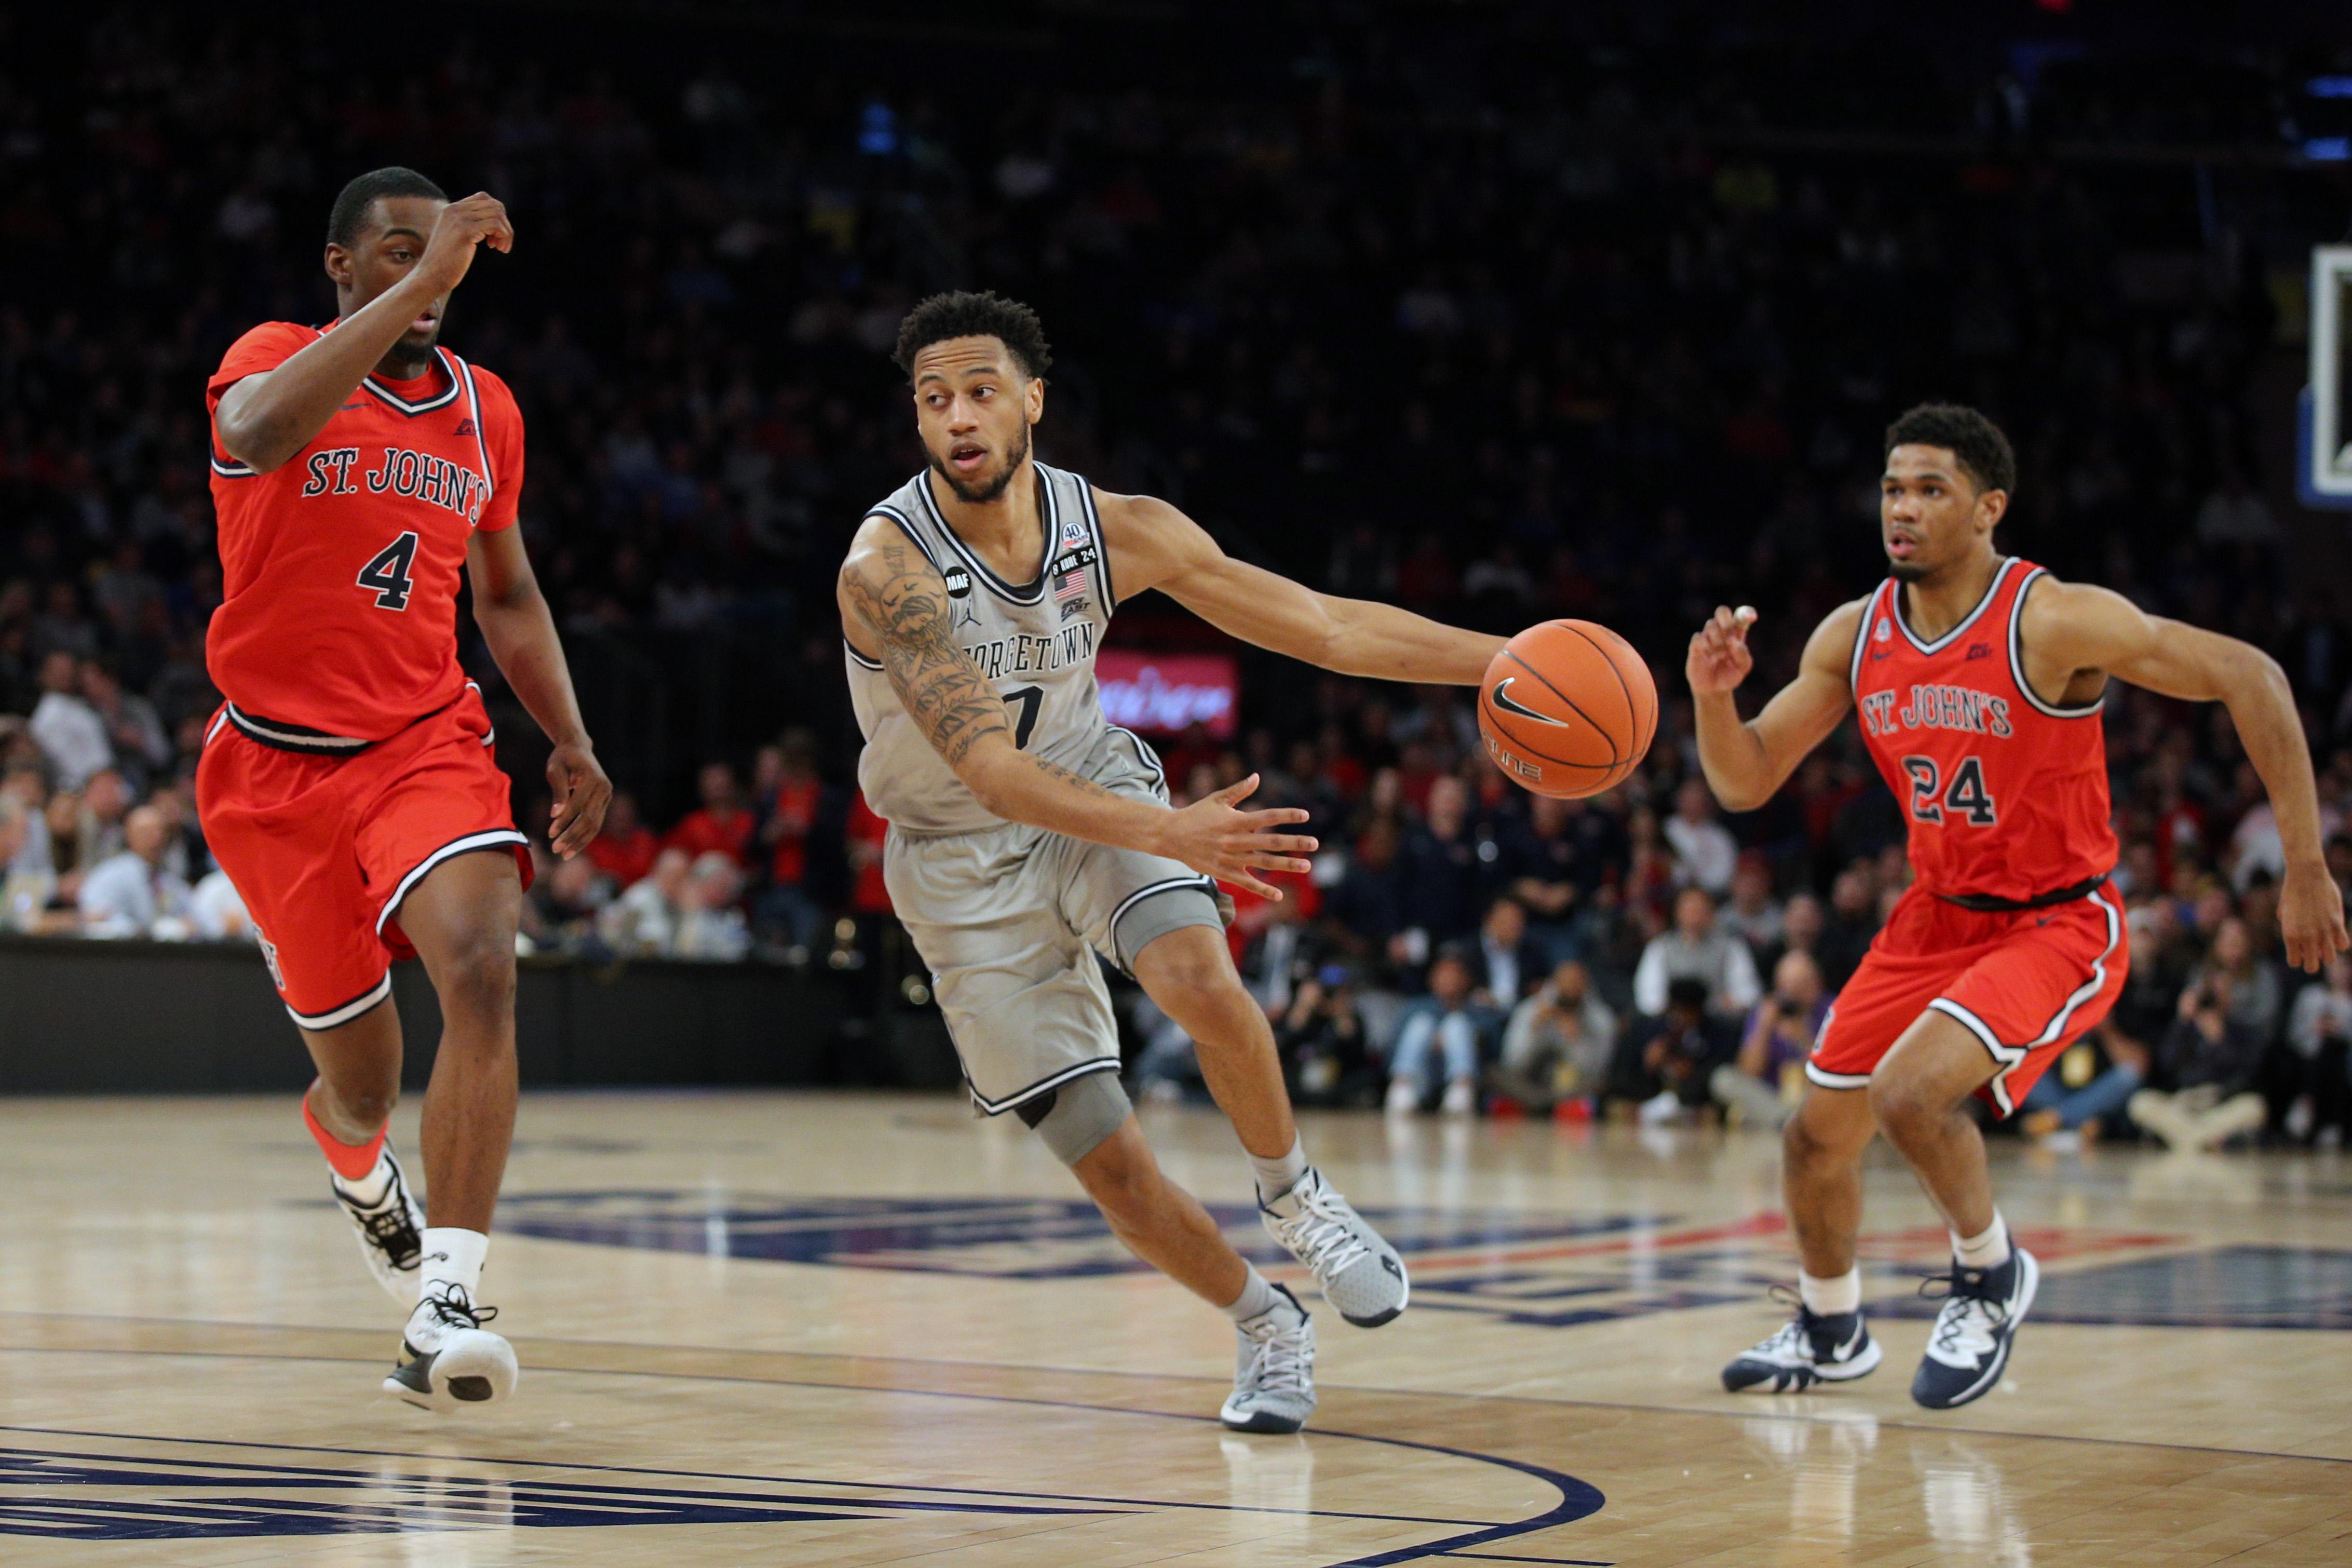 NCAA Basketball: Big East Tournament-Georgetown vs St. John's